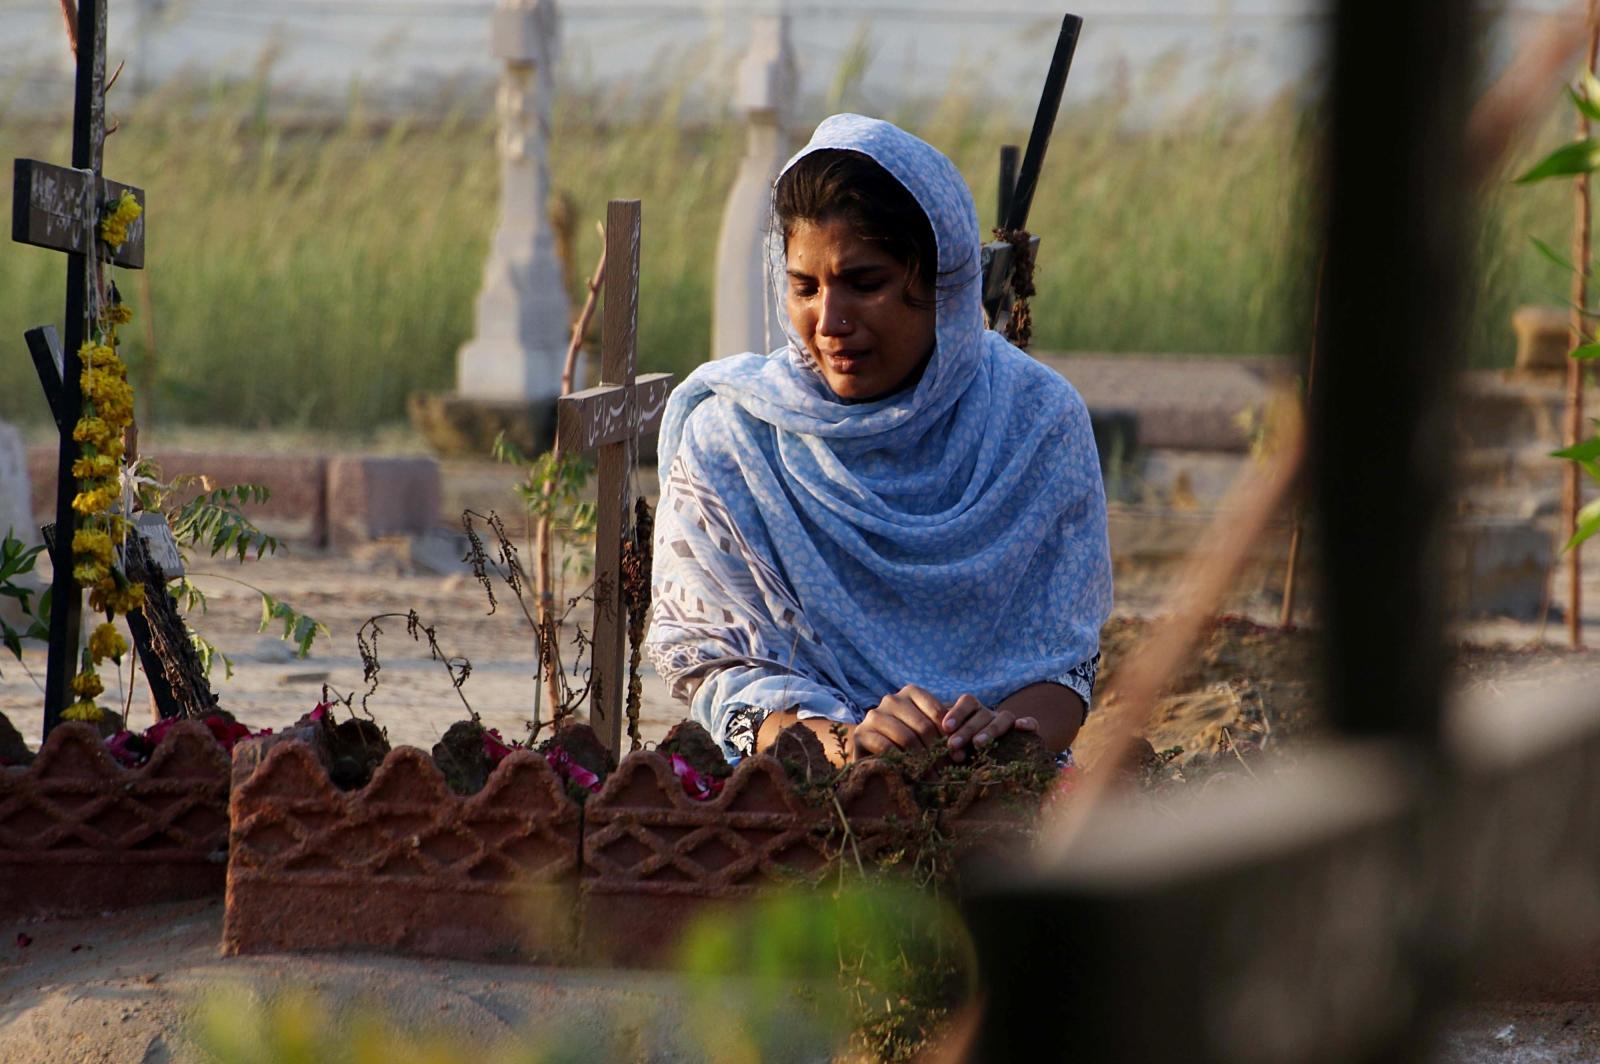 Pakistan  EPA/SHAHZAIB AKBER